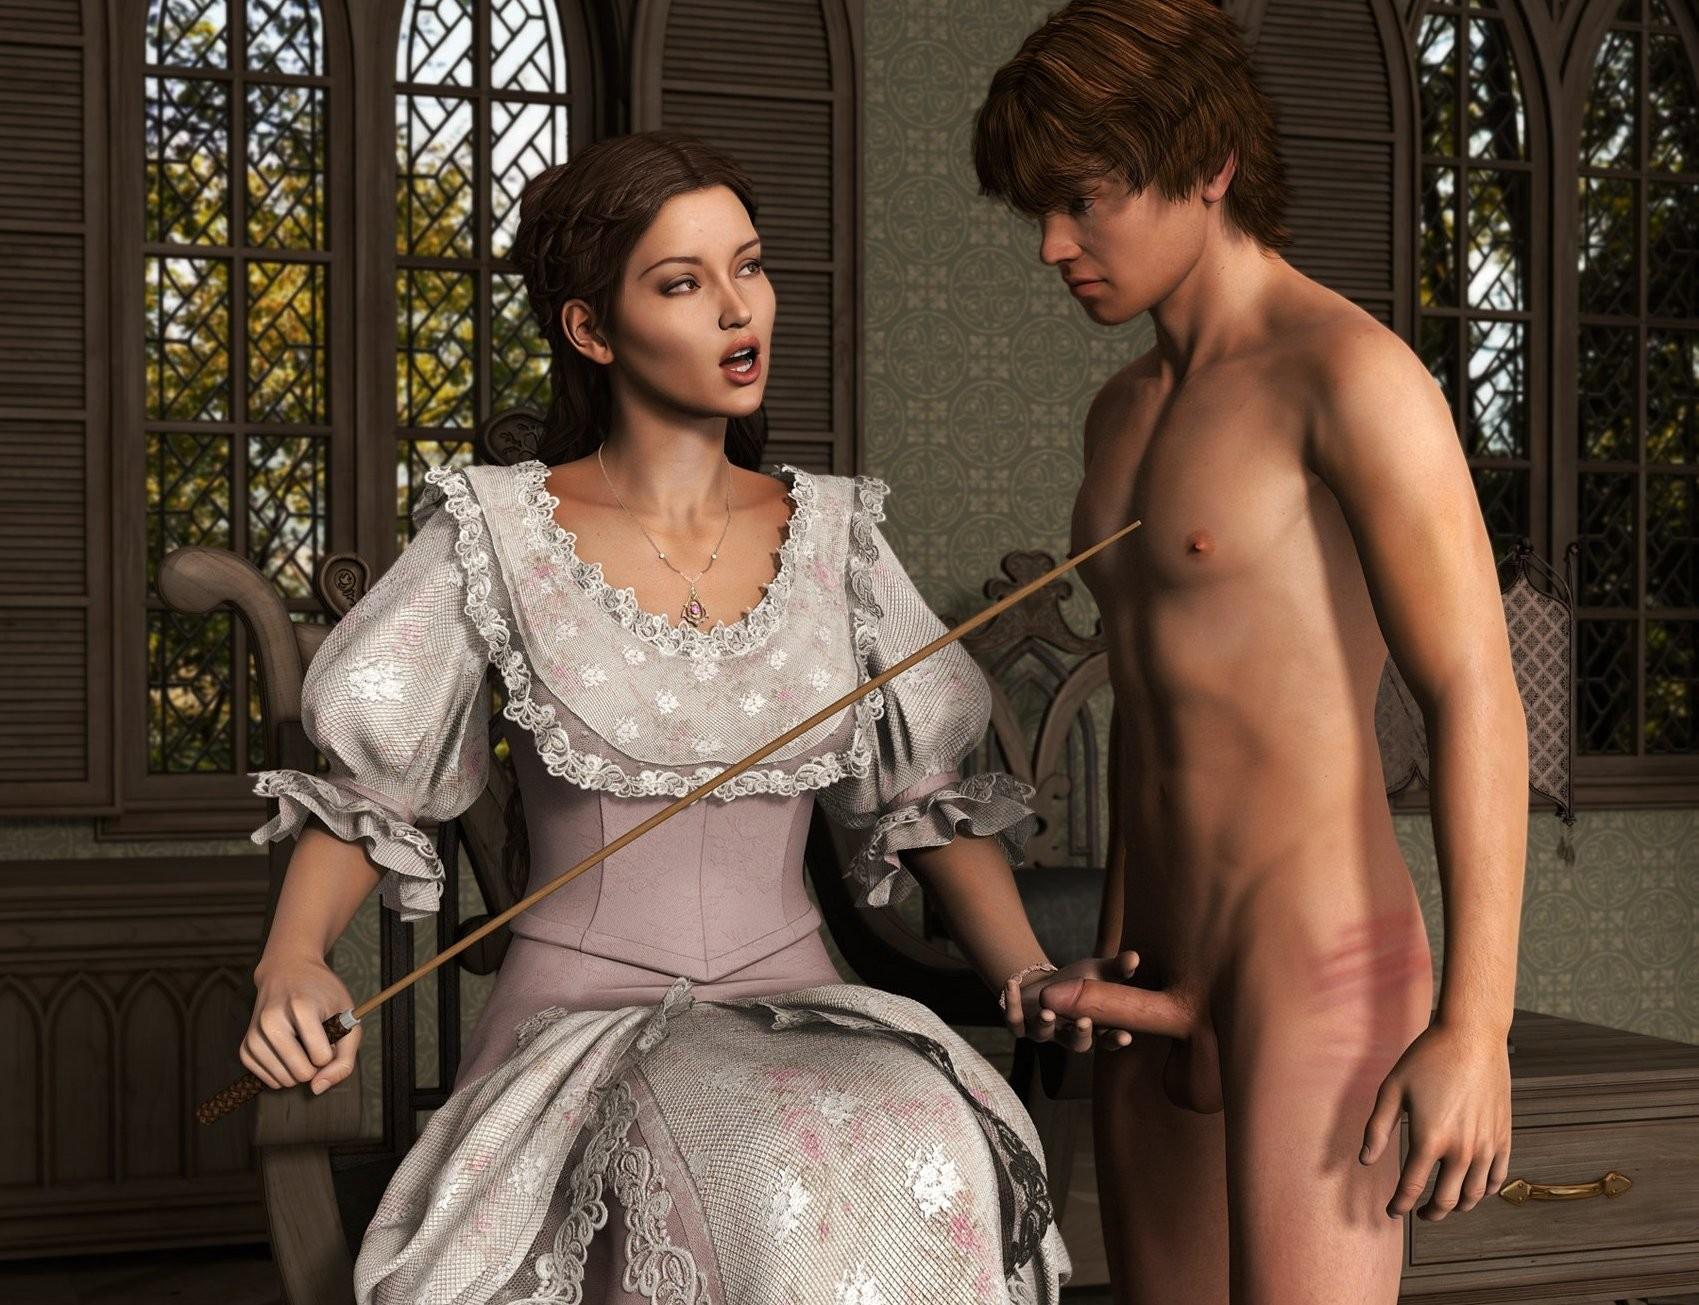 Women spanking males